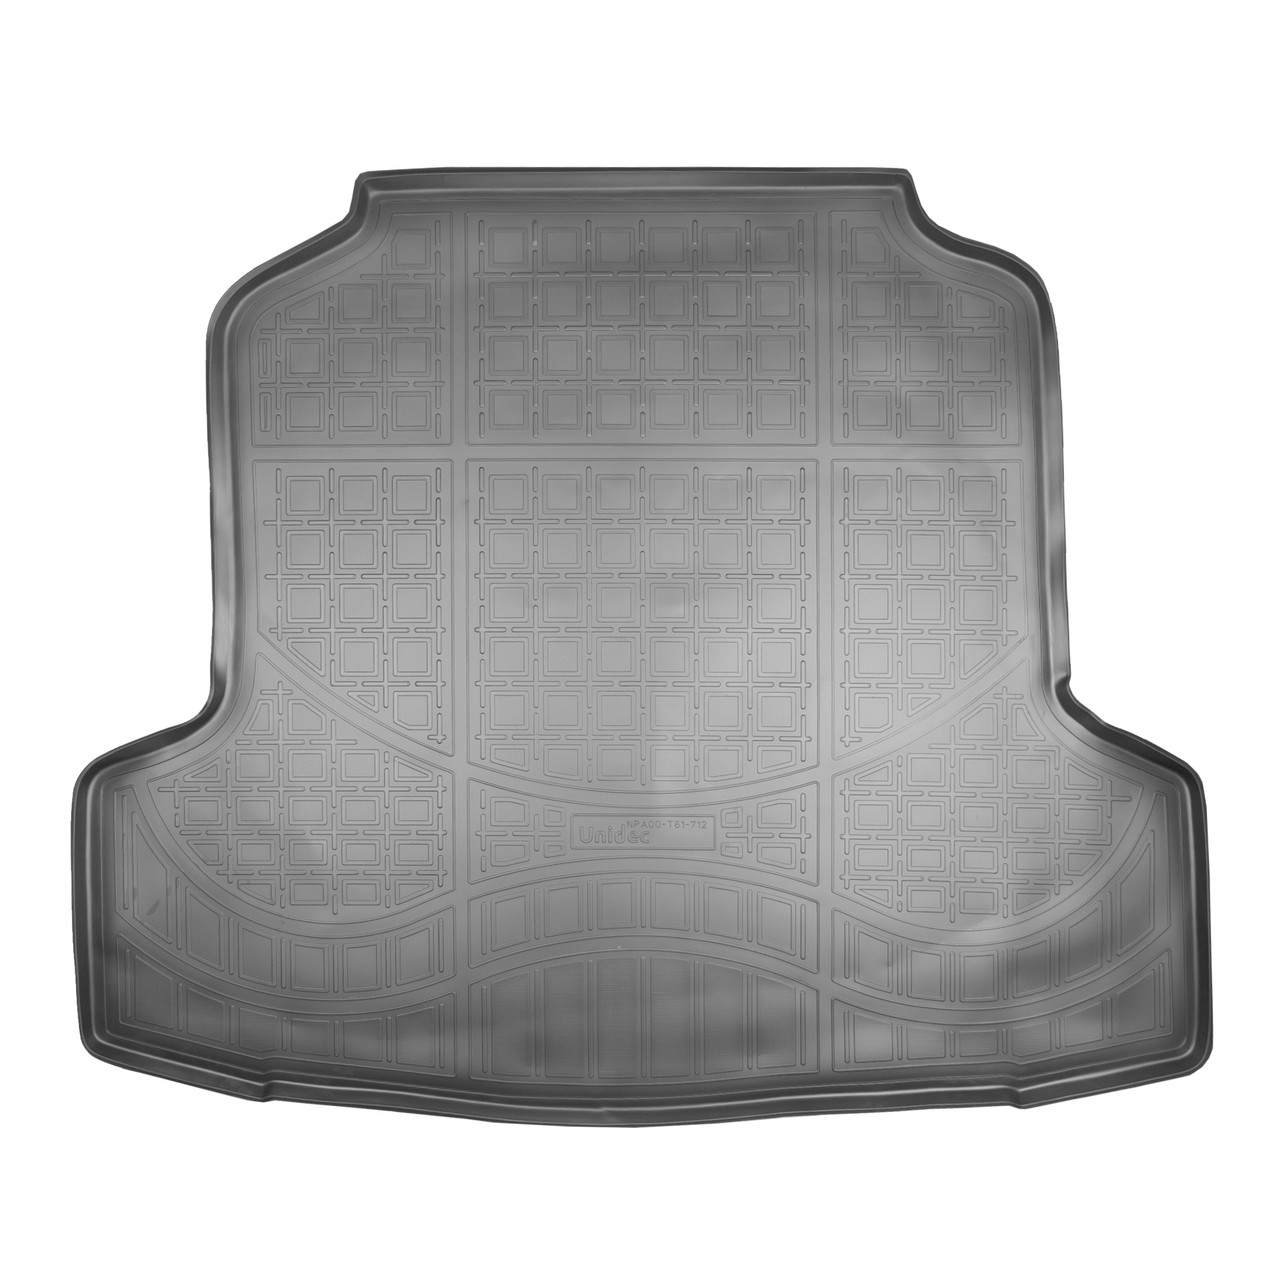 Коврик в багажник Nissan Teana (J33) SD (2014)